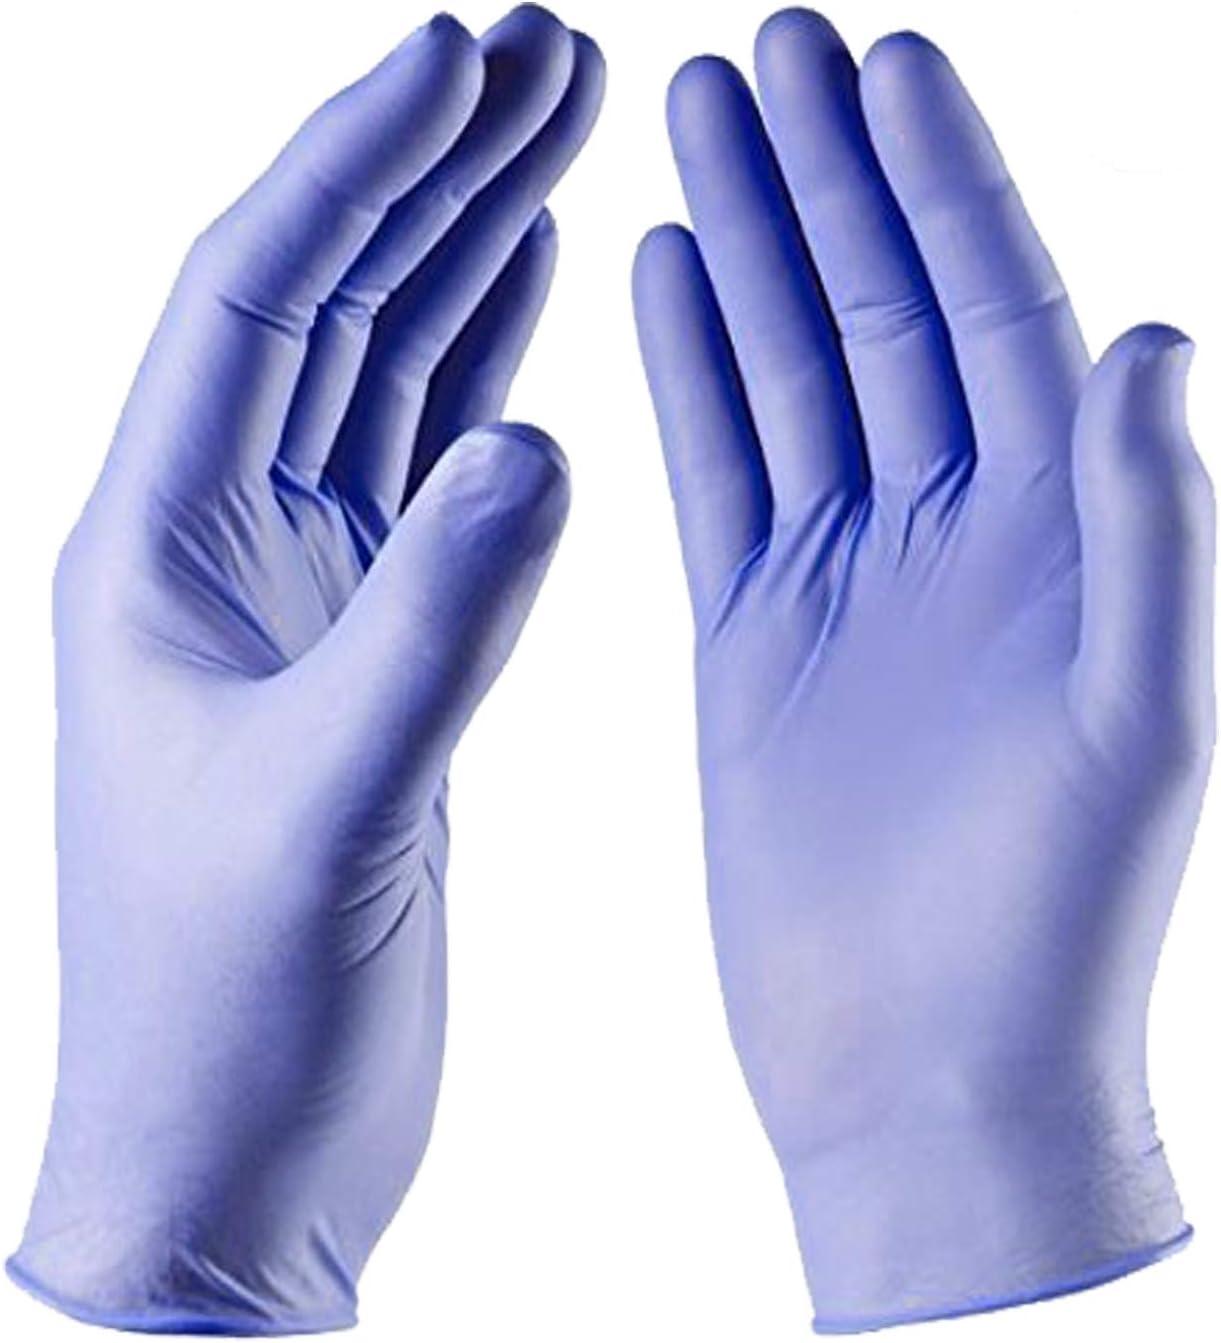 Blue Disposable Examination Medical Nitrile Vinyl Gloves Latex /& Powder Free PPE